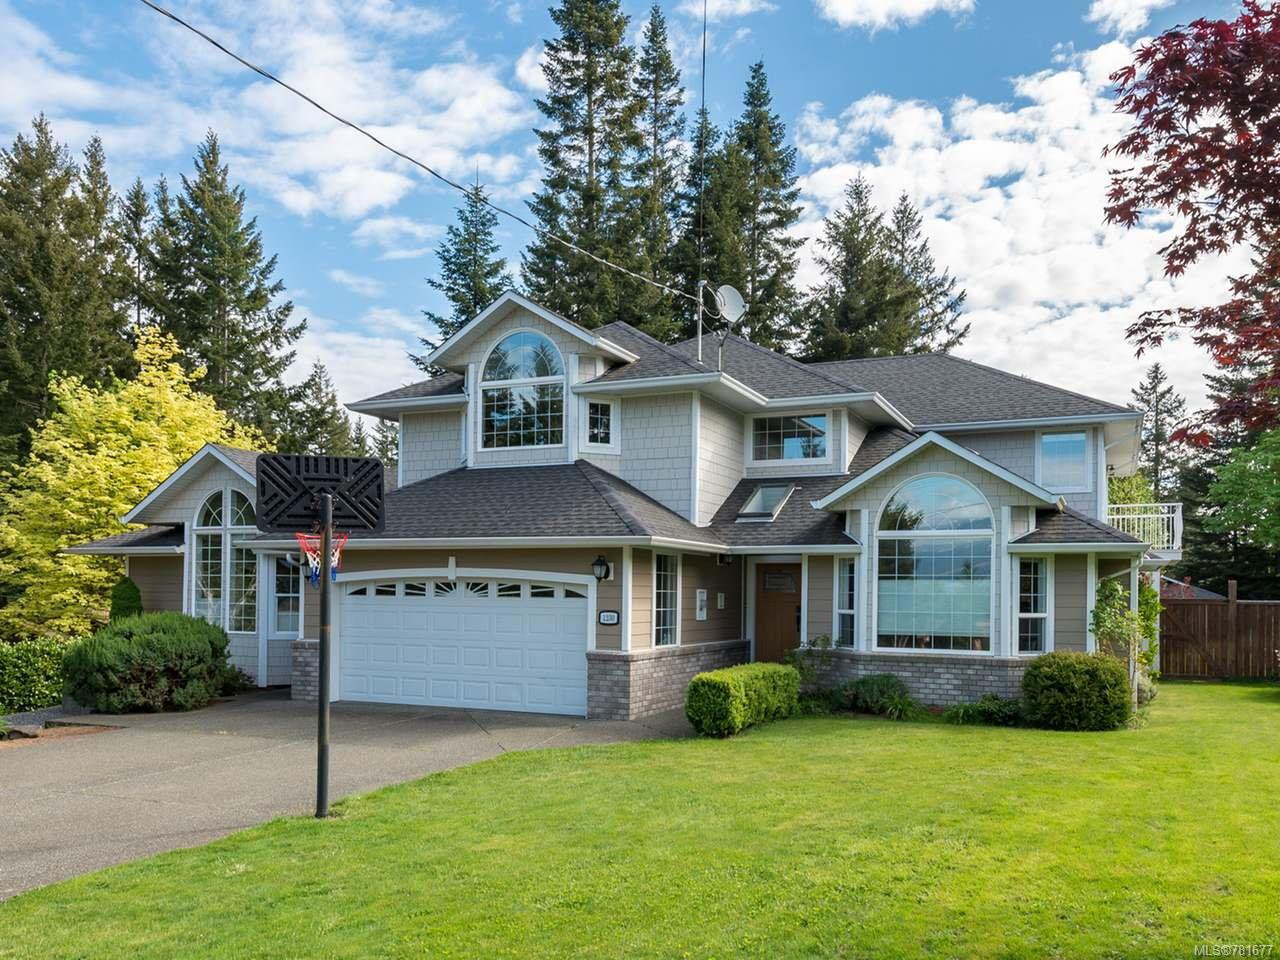 Main Photo: 1230 Glen Urquhart Dr in COURTENAY: CV Courtenay East House for sale (Comox Valley)  : MLS®# 781677